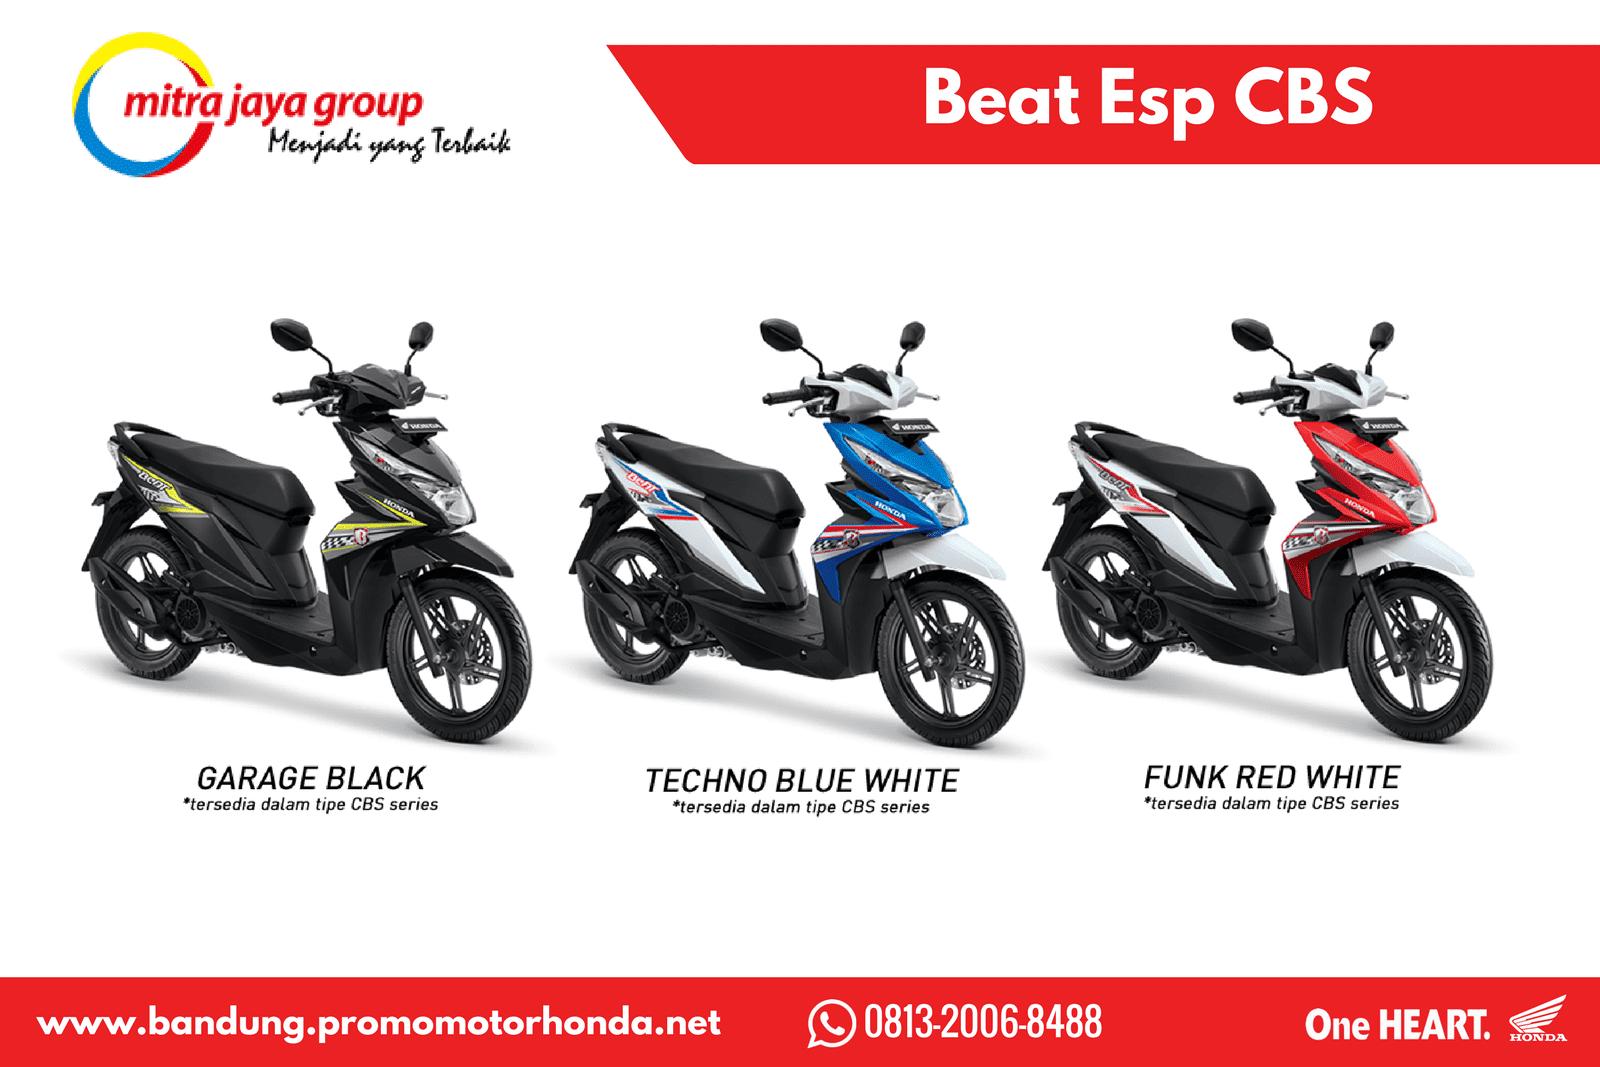 Honda Beat Sporty Cbs Techno Blue White List Harga Terkini Dan New Vario 110 Esp Iss Grande Tangerang Kredit Motor Terbaru Wilayah Bandung